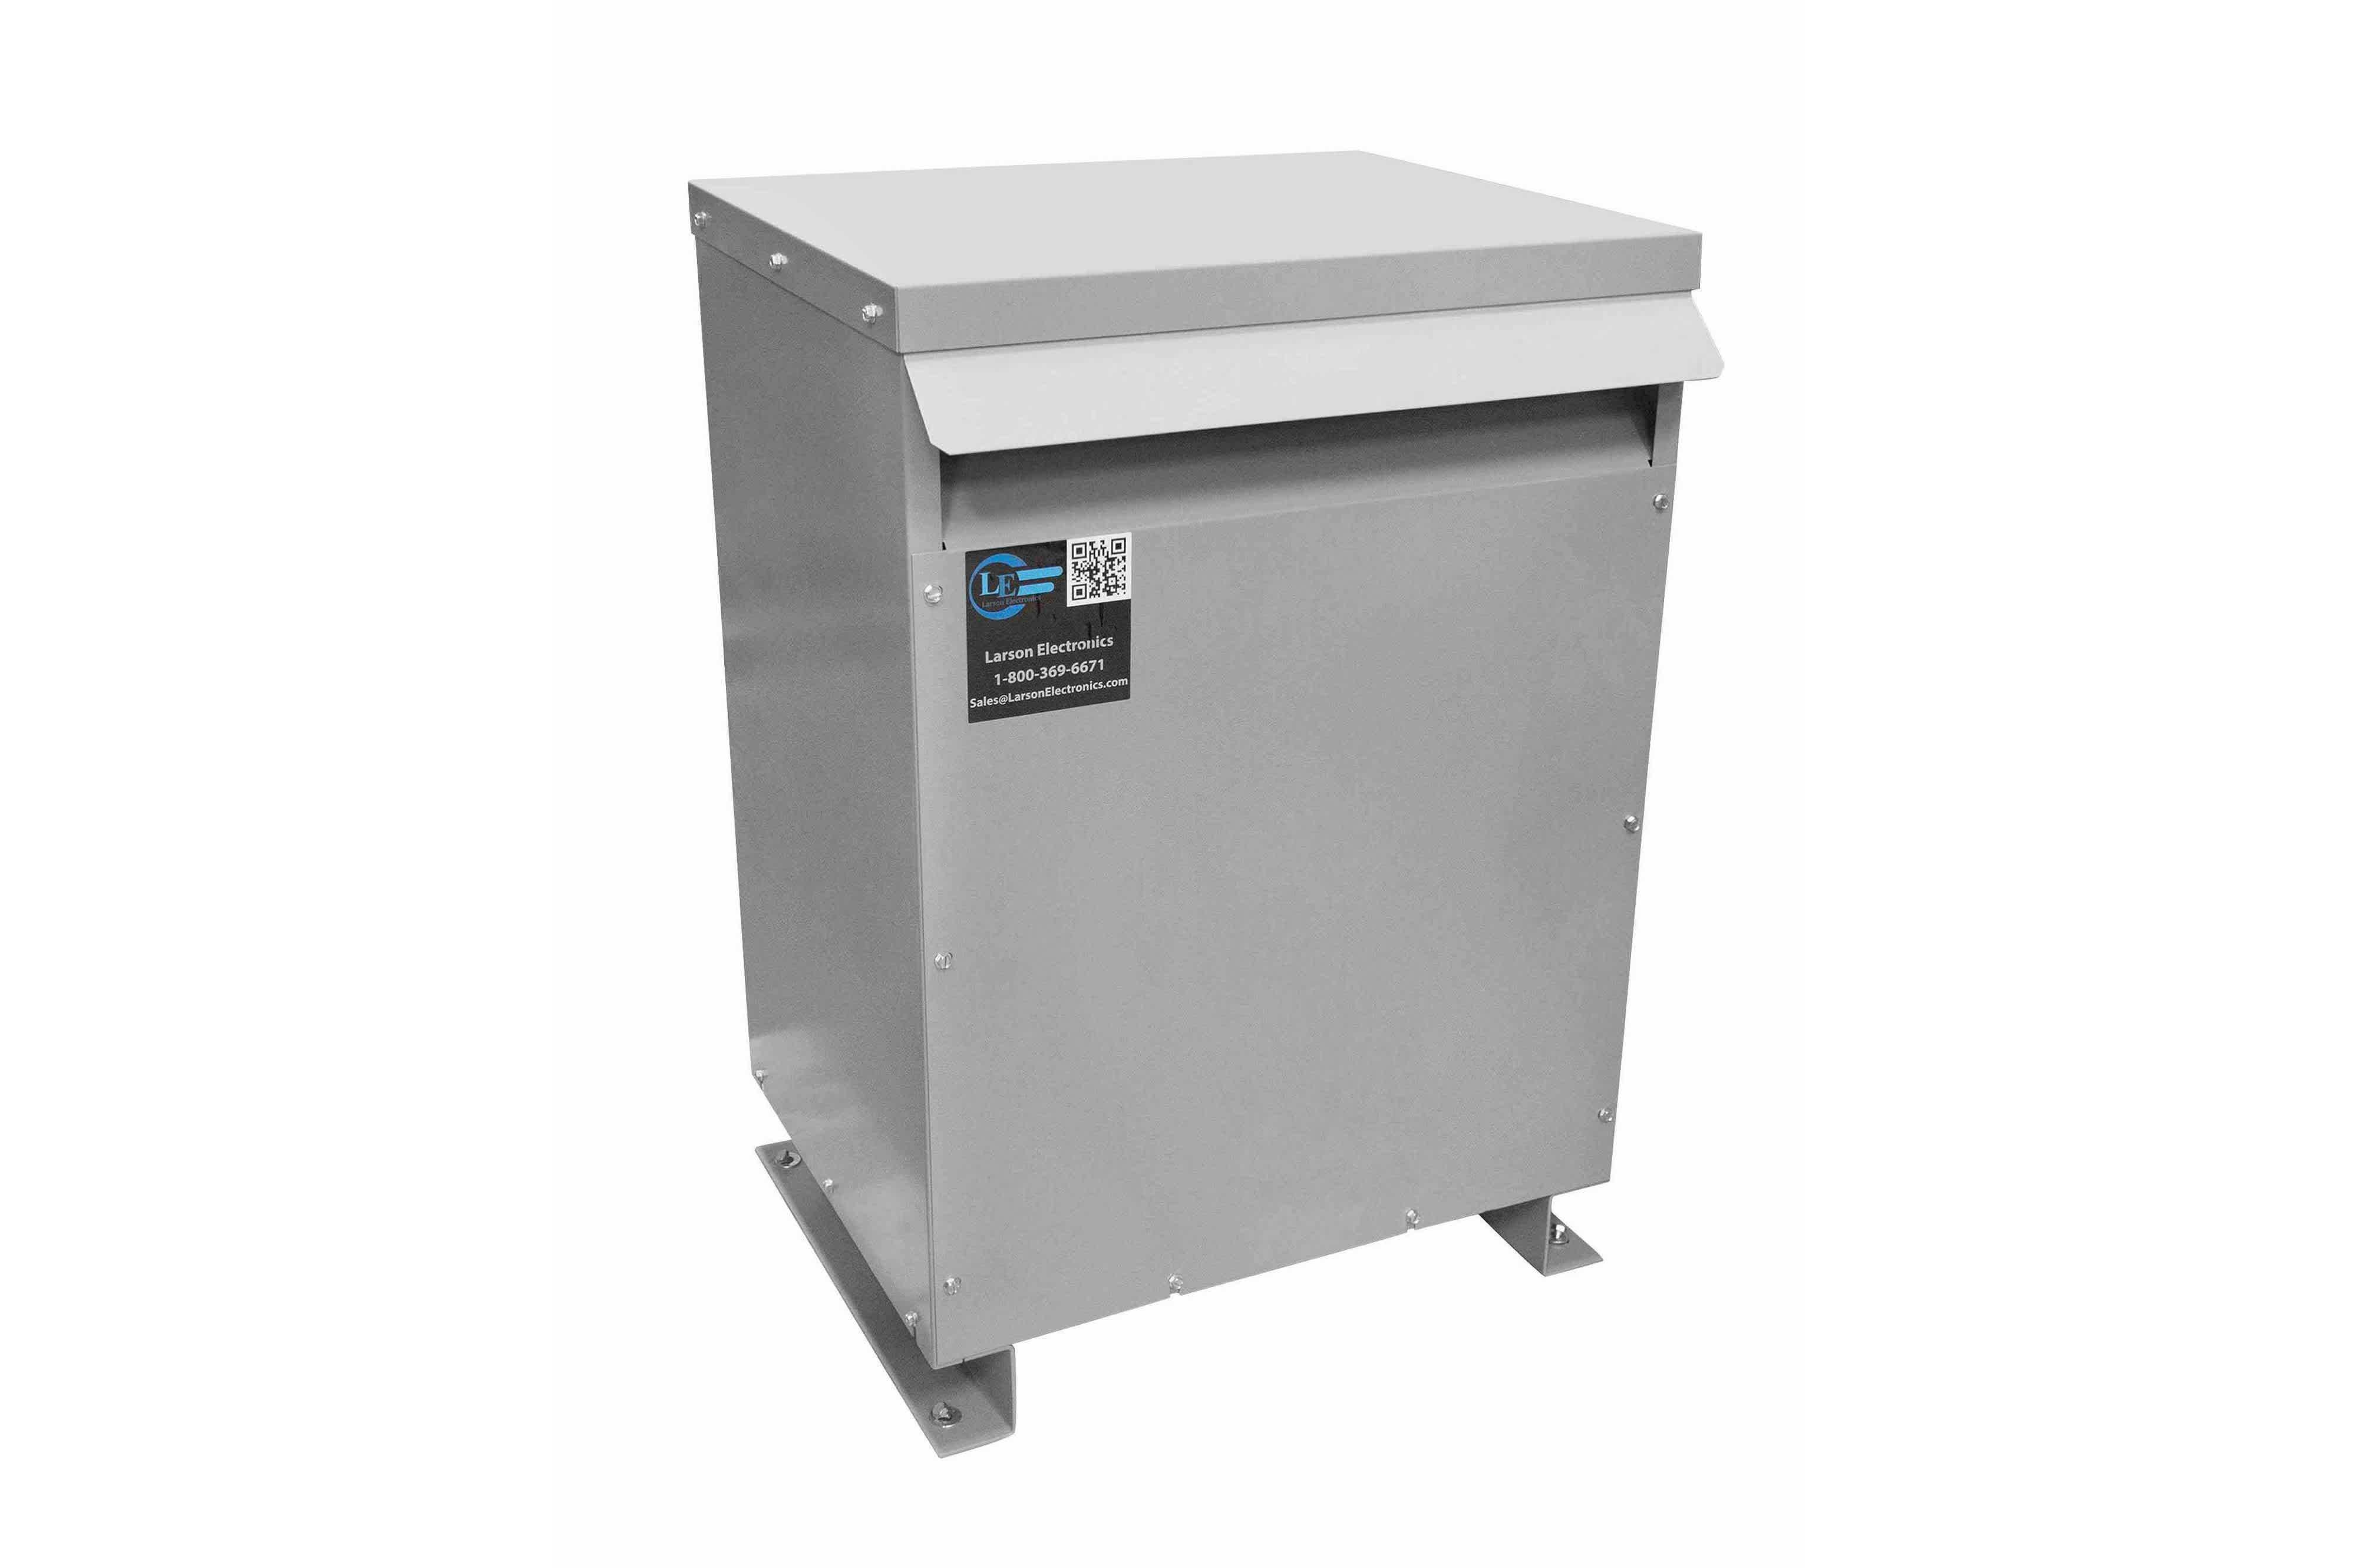 10 kVA 3PH DOE Transformer, 220V Delta Primary, 208Y/120 Wye-N Secondary, N3R, Ventilated, 60 Hz